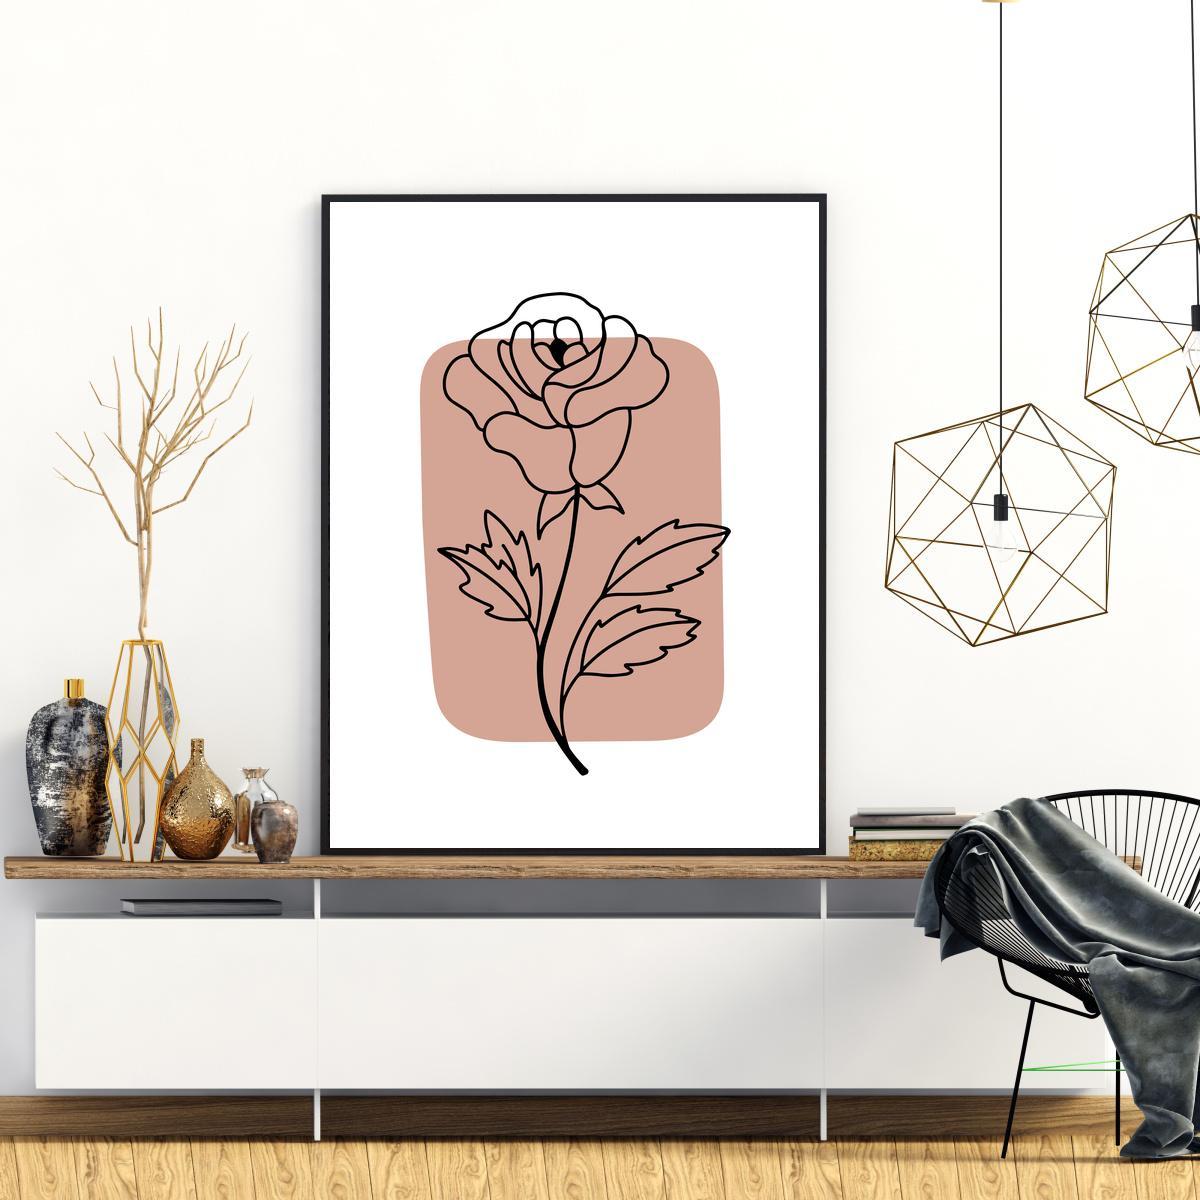 Plakat - Ruže (S040501SA4)